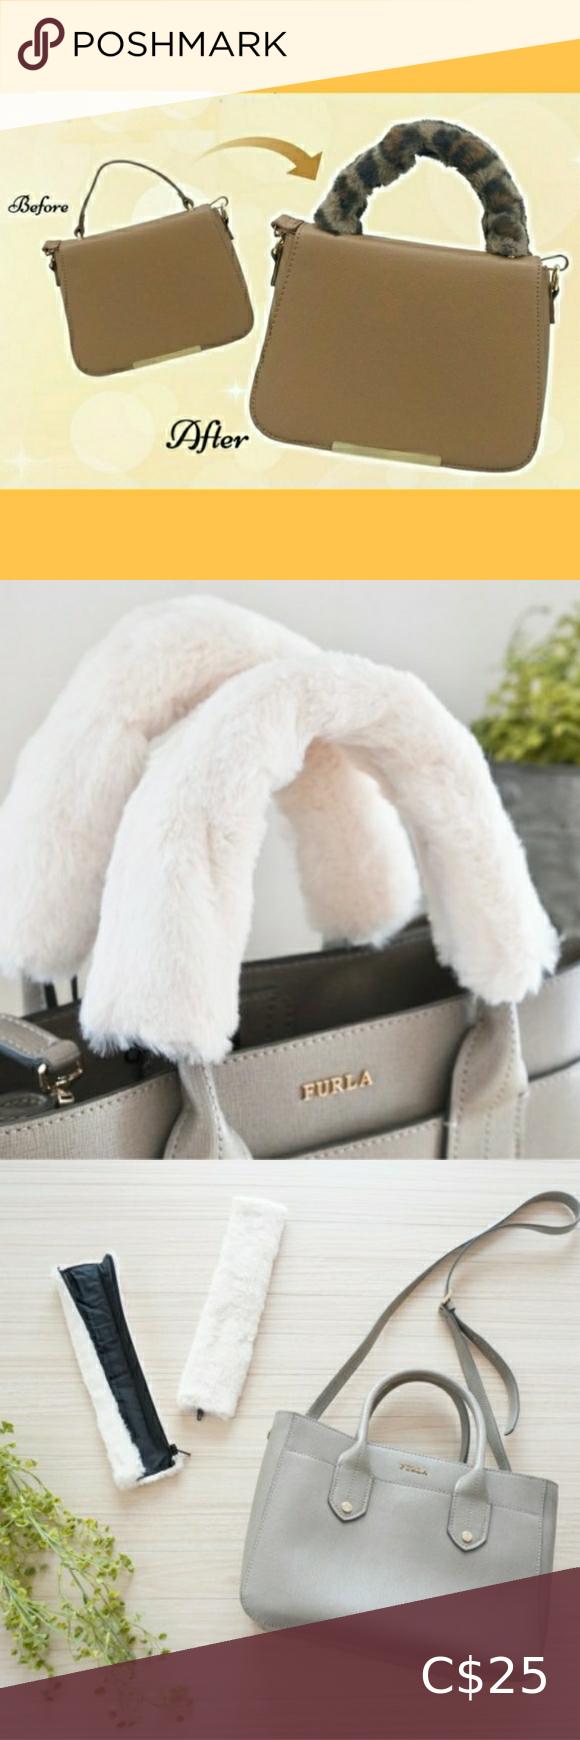 White Fur Bag Handle Wrap Handle Cover In 2020 Fur Bag Bag Handle Handbag Handles